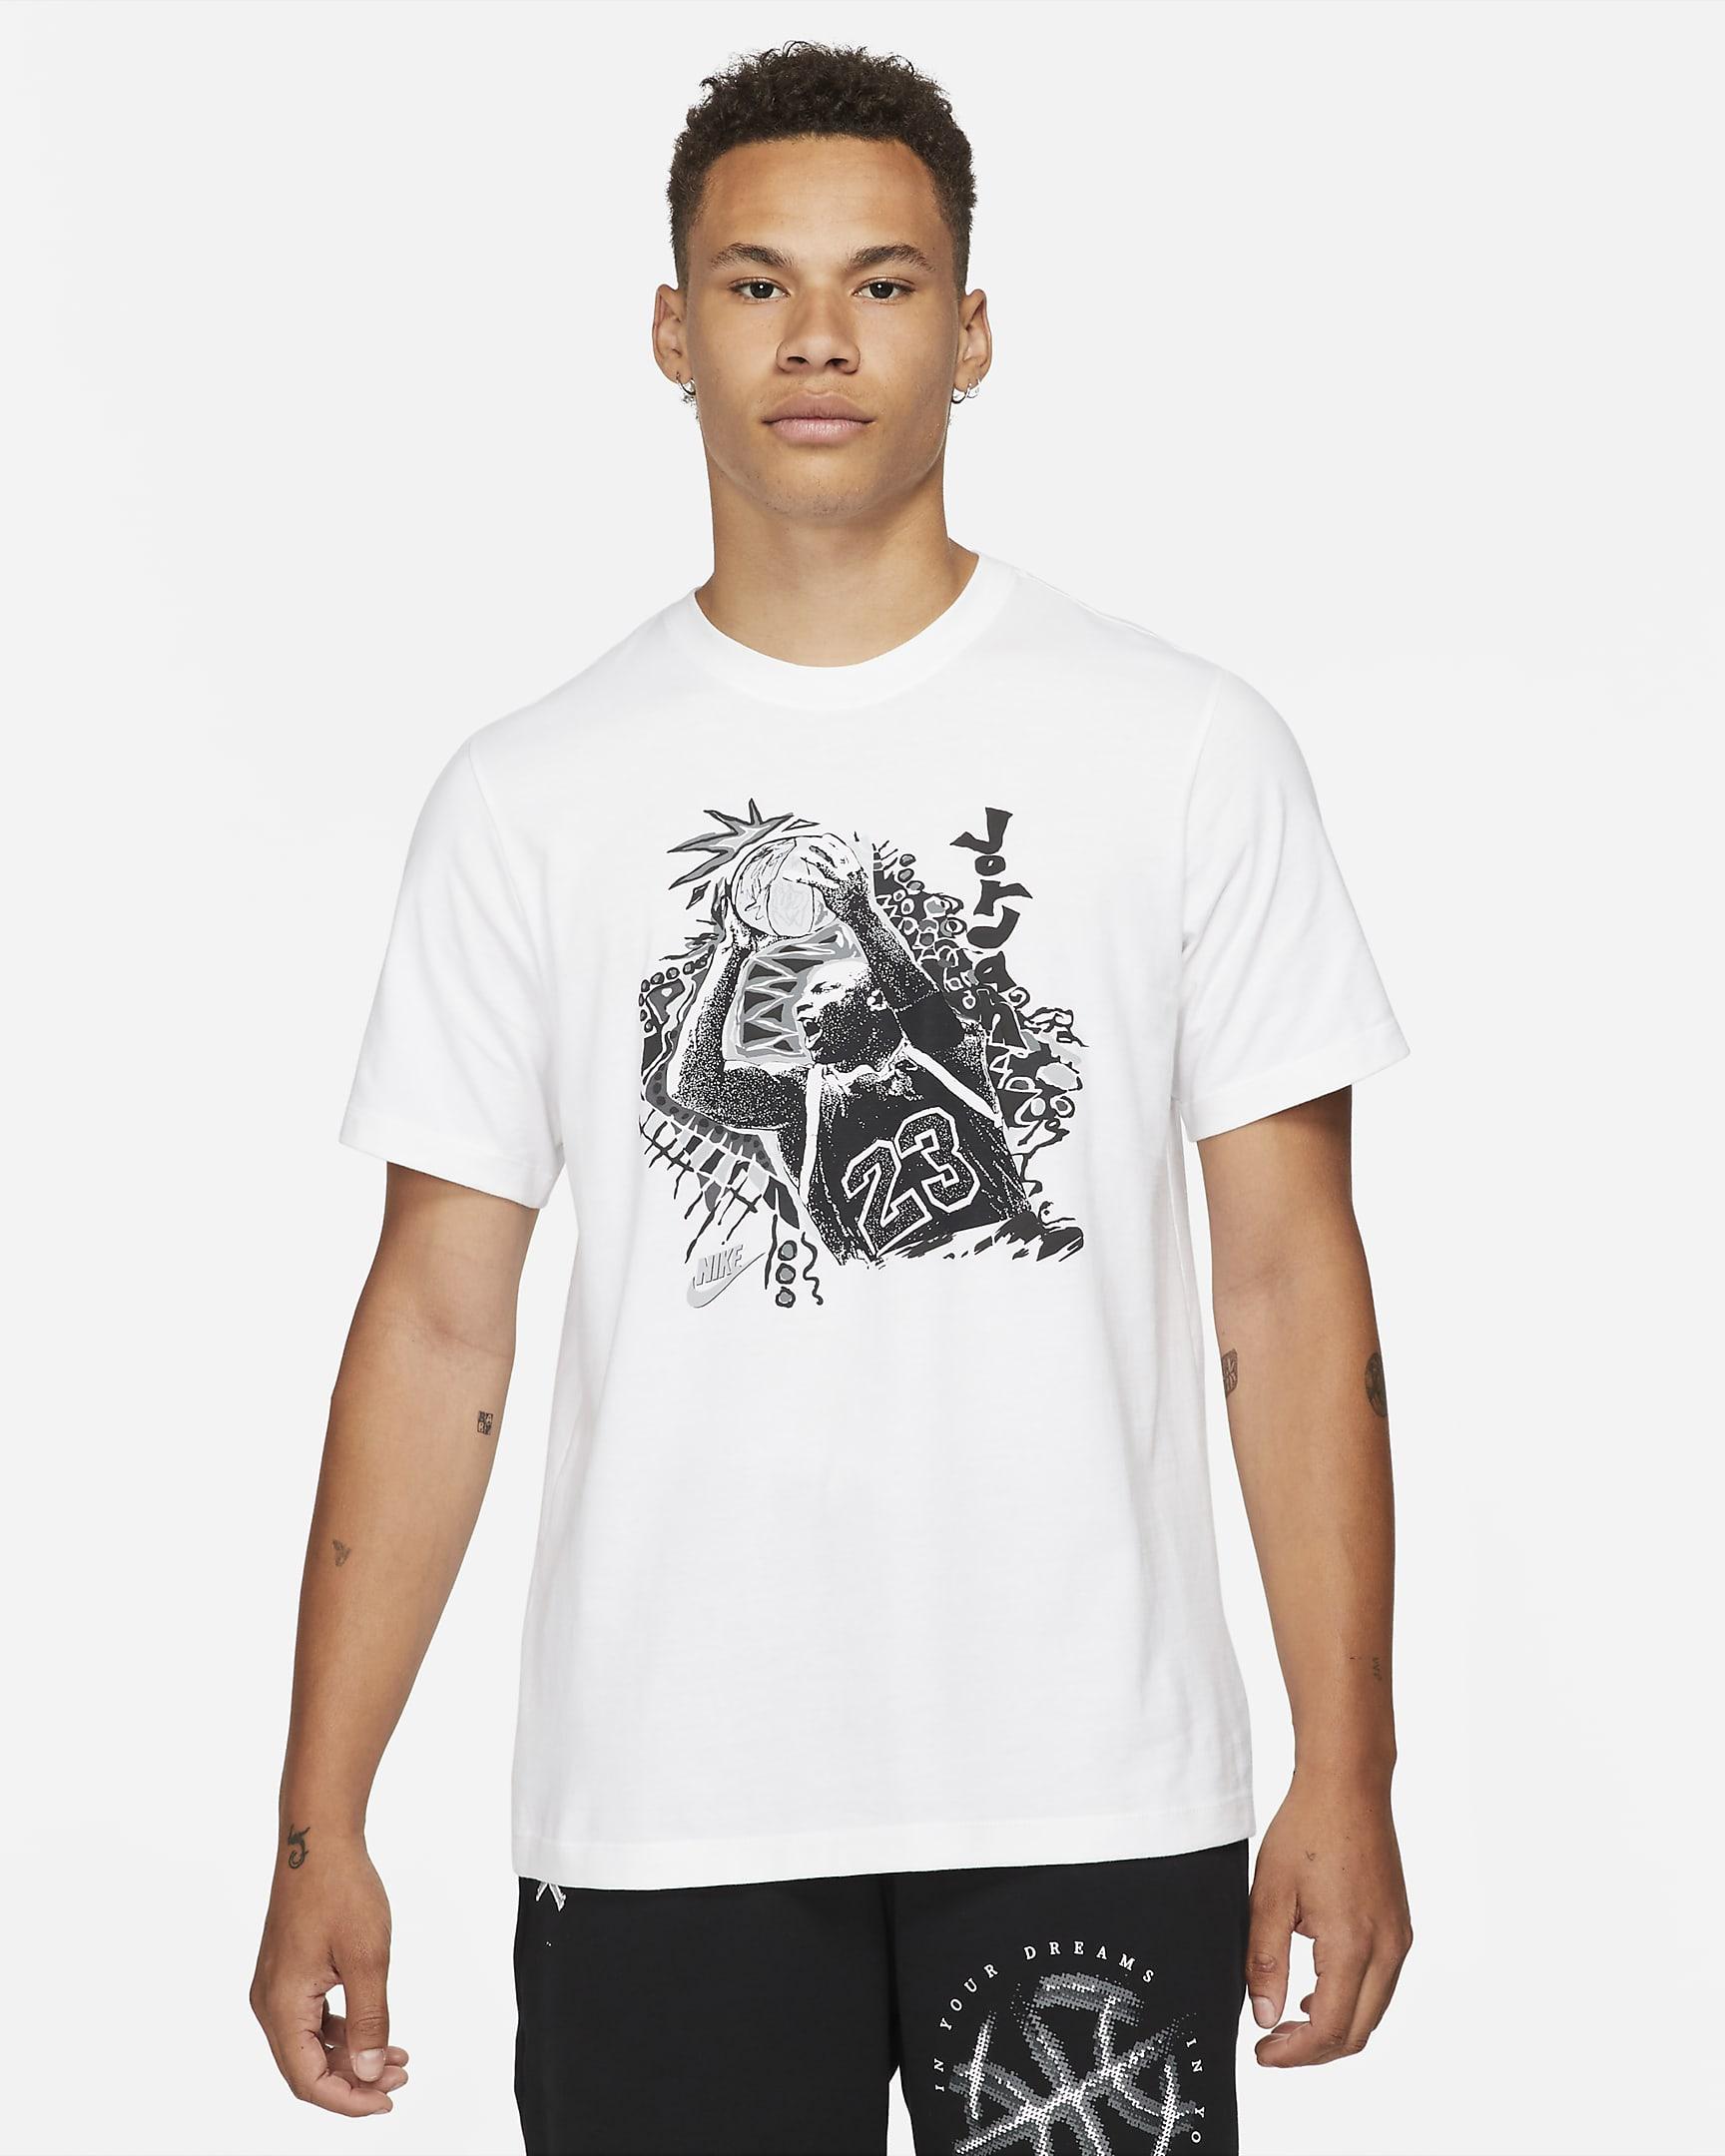 jordan-vintage-mens-graphic-t-shirt-N42Lh8.png